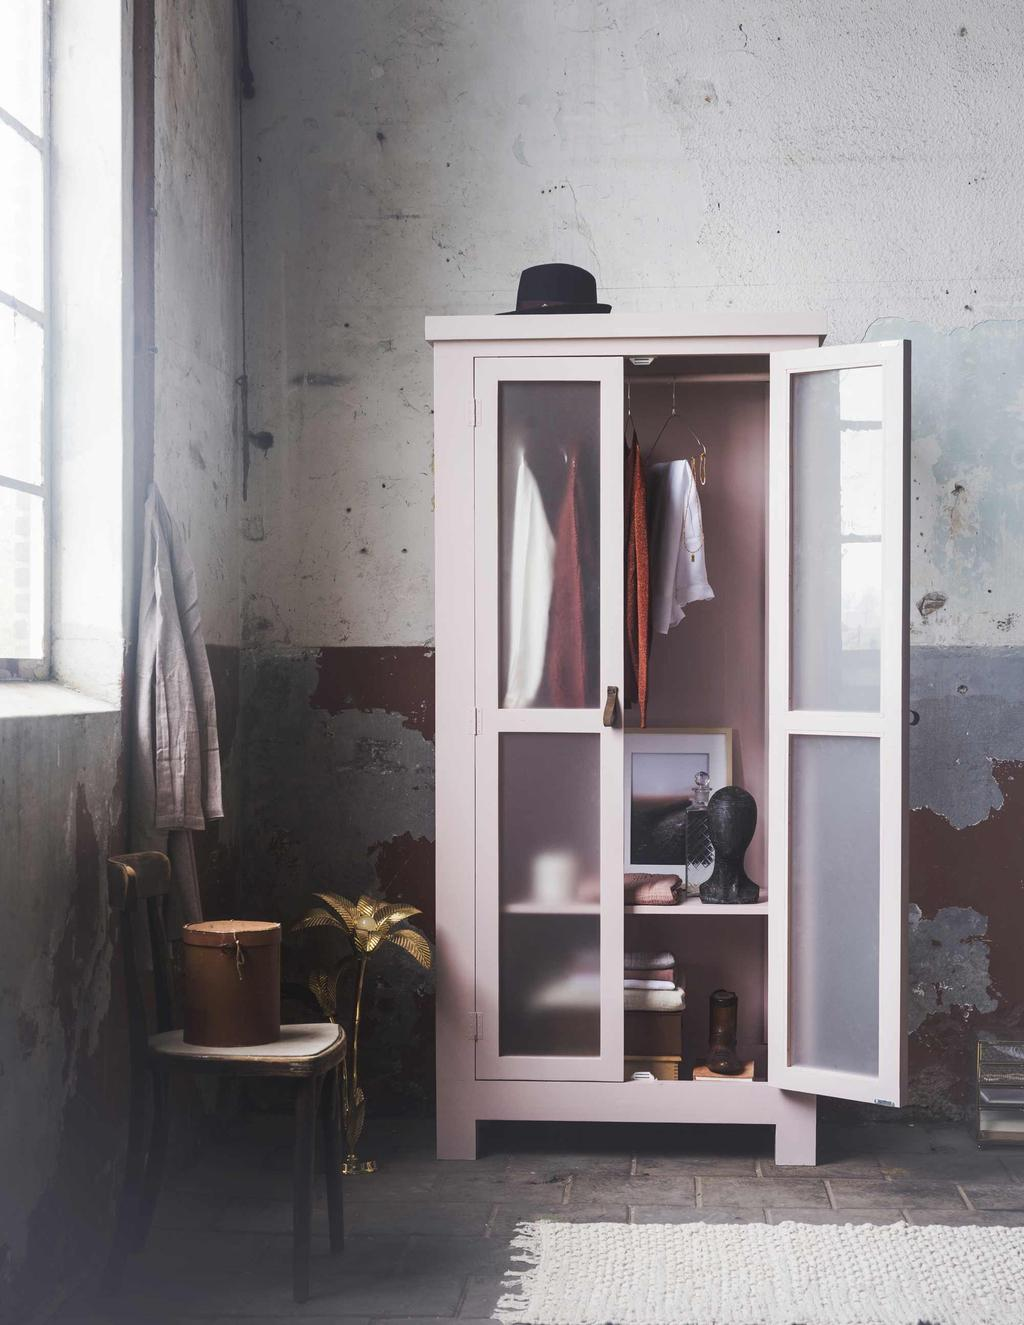 Marie Kondo - opgeruimde kledingkast